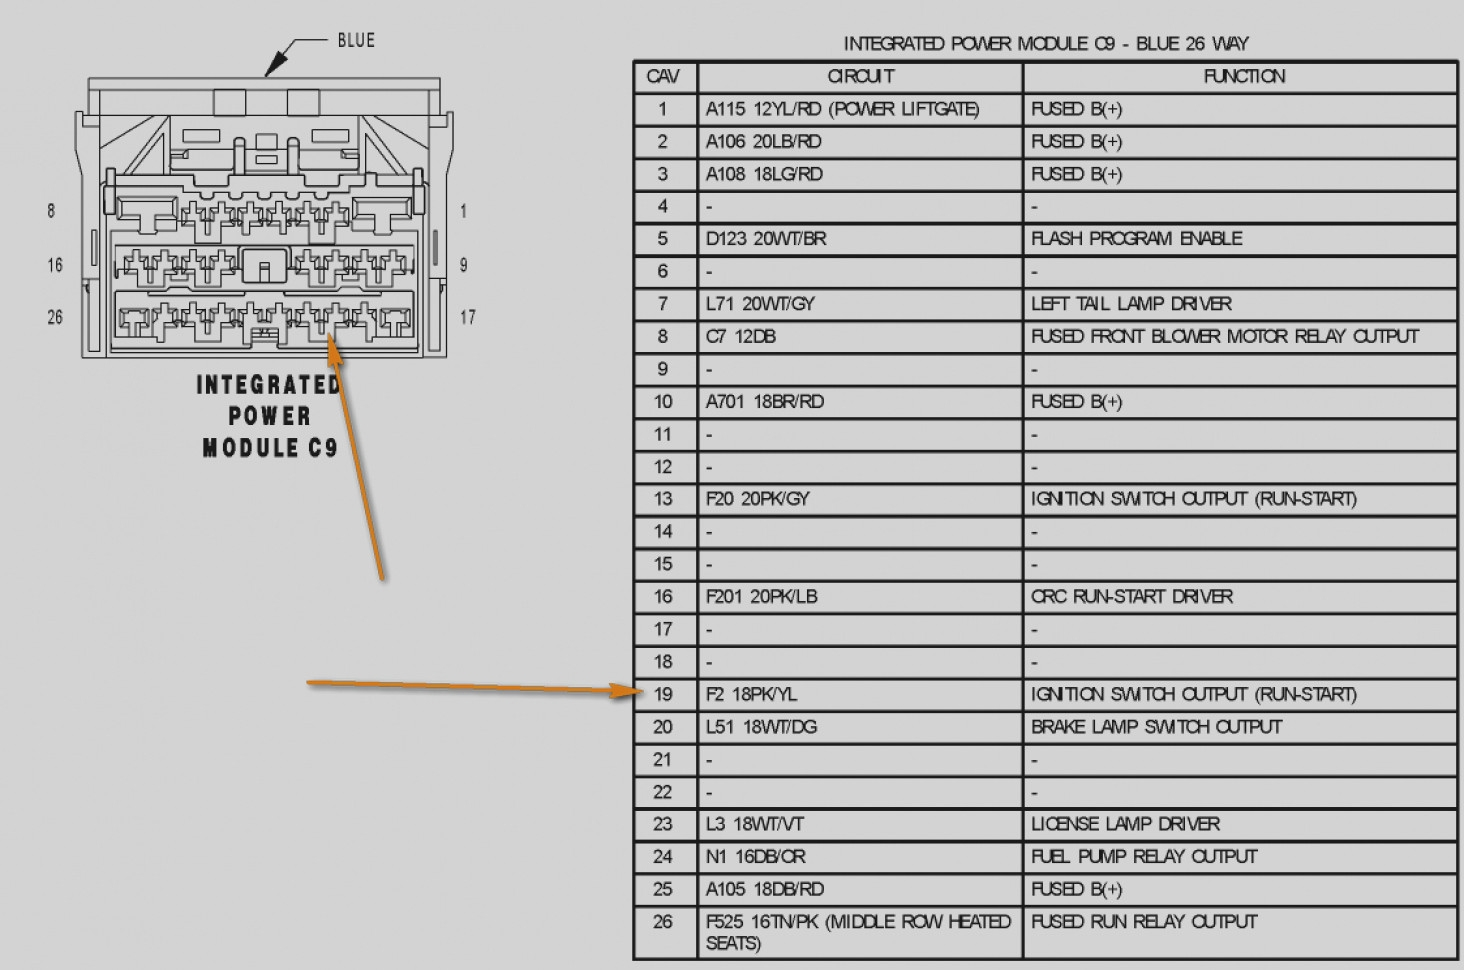 hight resolution of 2007 chrysler sebring wiring diagram tipm 2007 chrysler sebring wiring diagram wire center u2022 rh